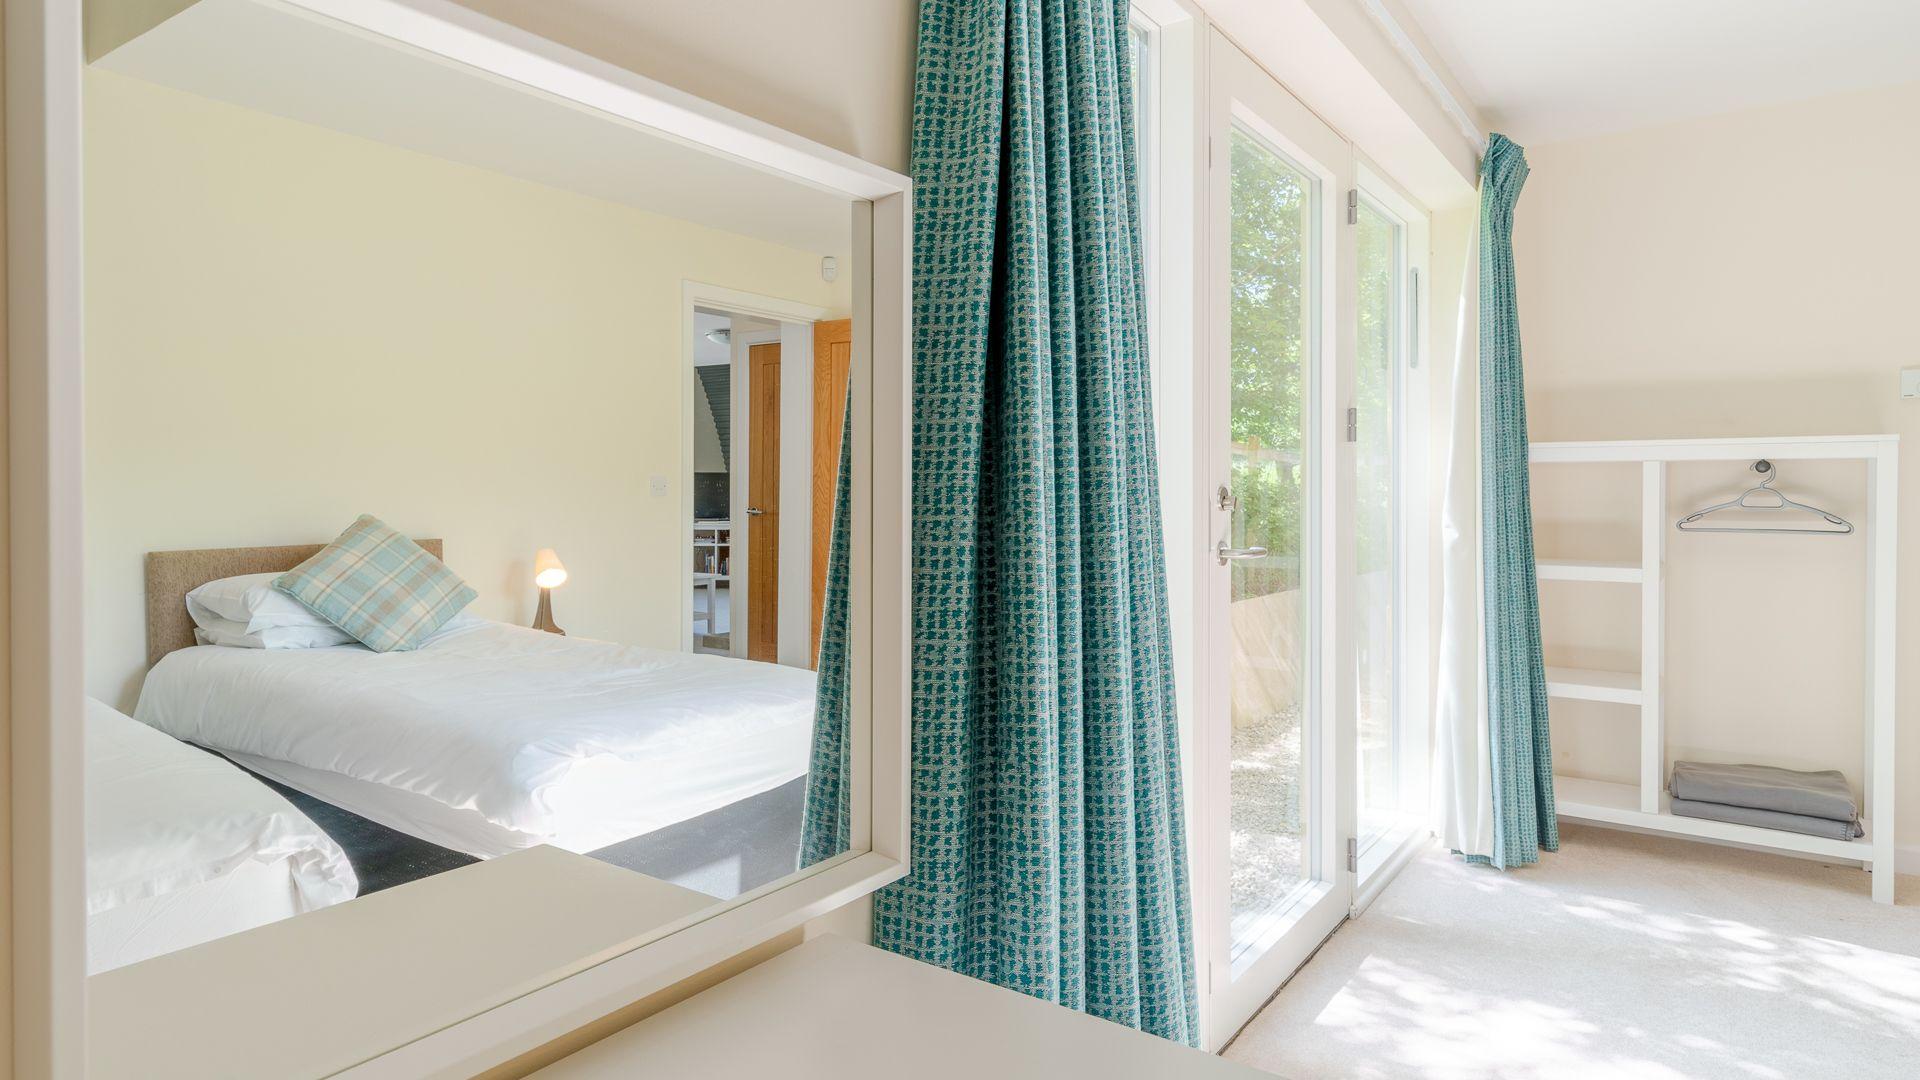 Bedroom One, Ledge View, Bolthole Retreats